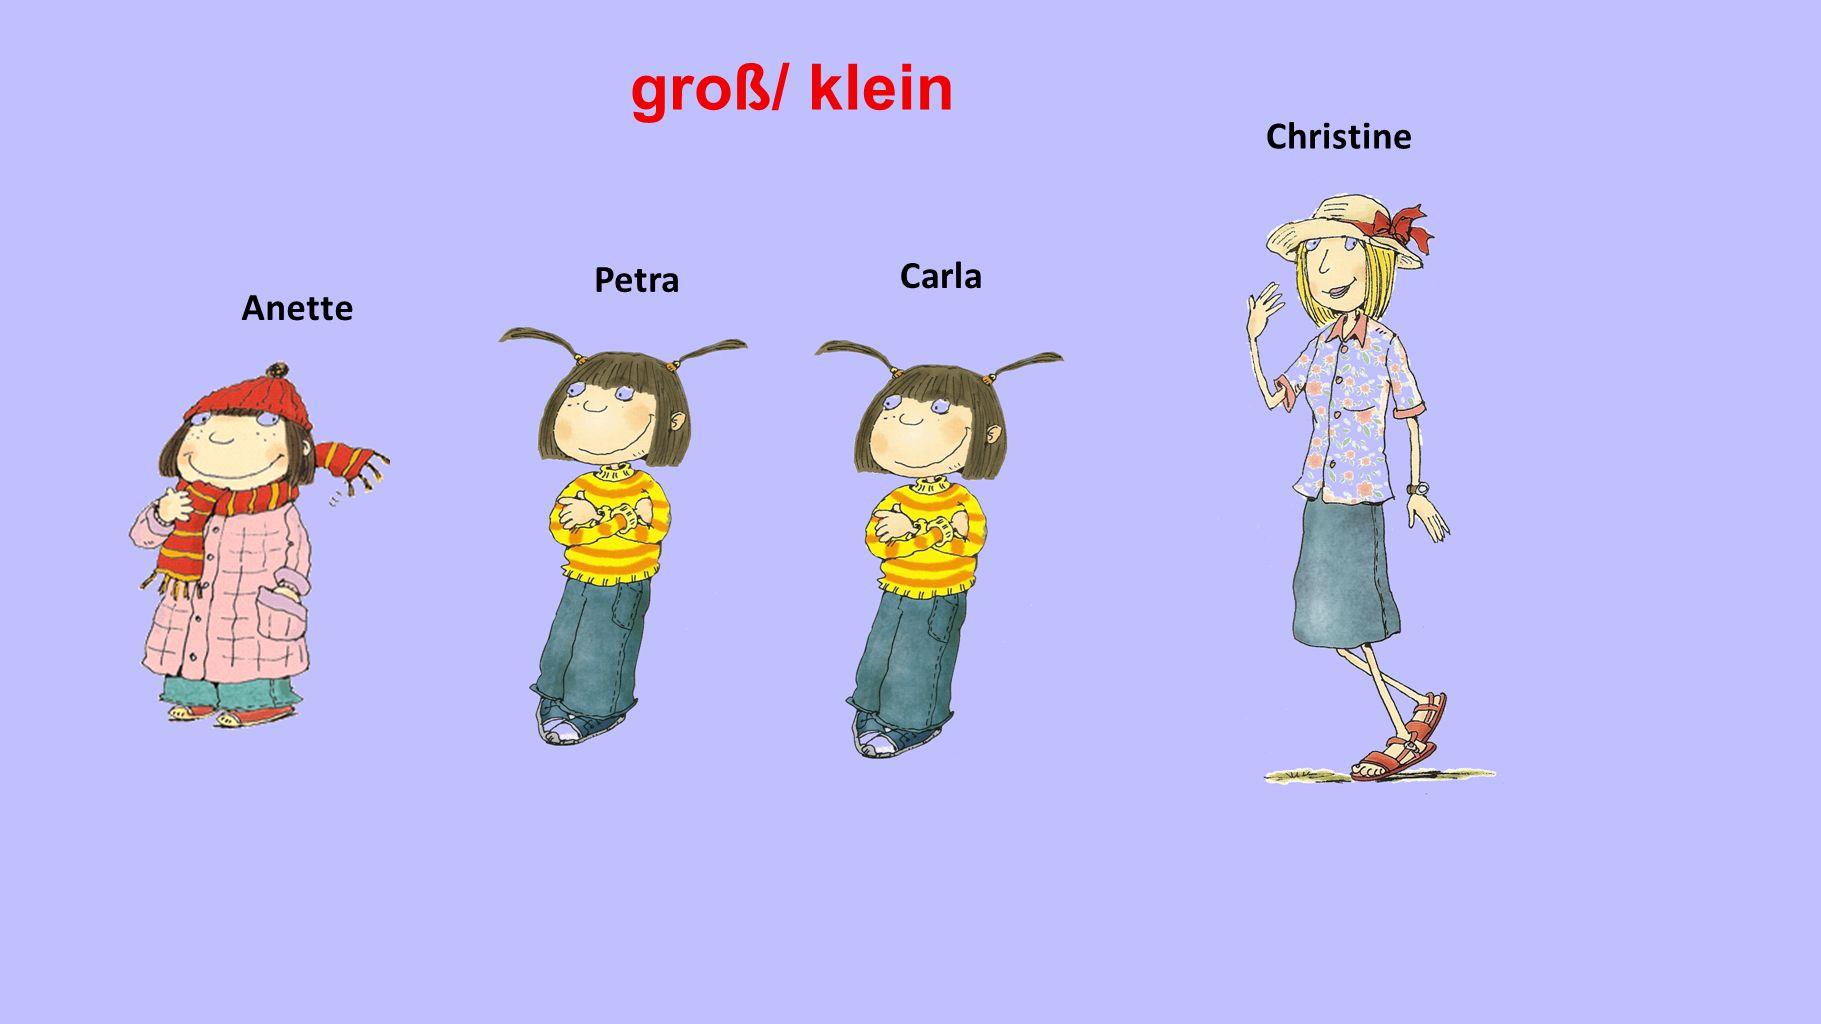 Petra Anette Carla groß/ klein Christine